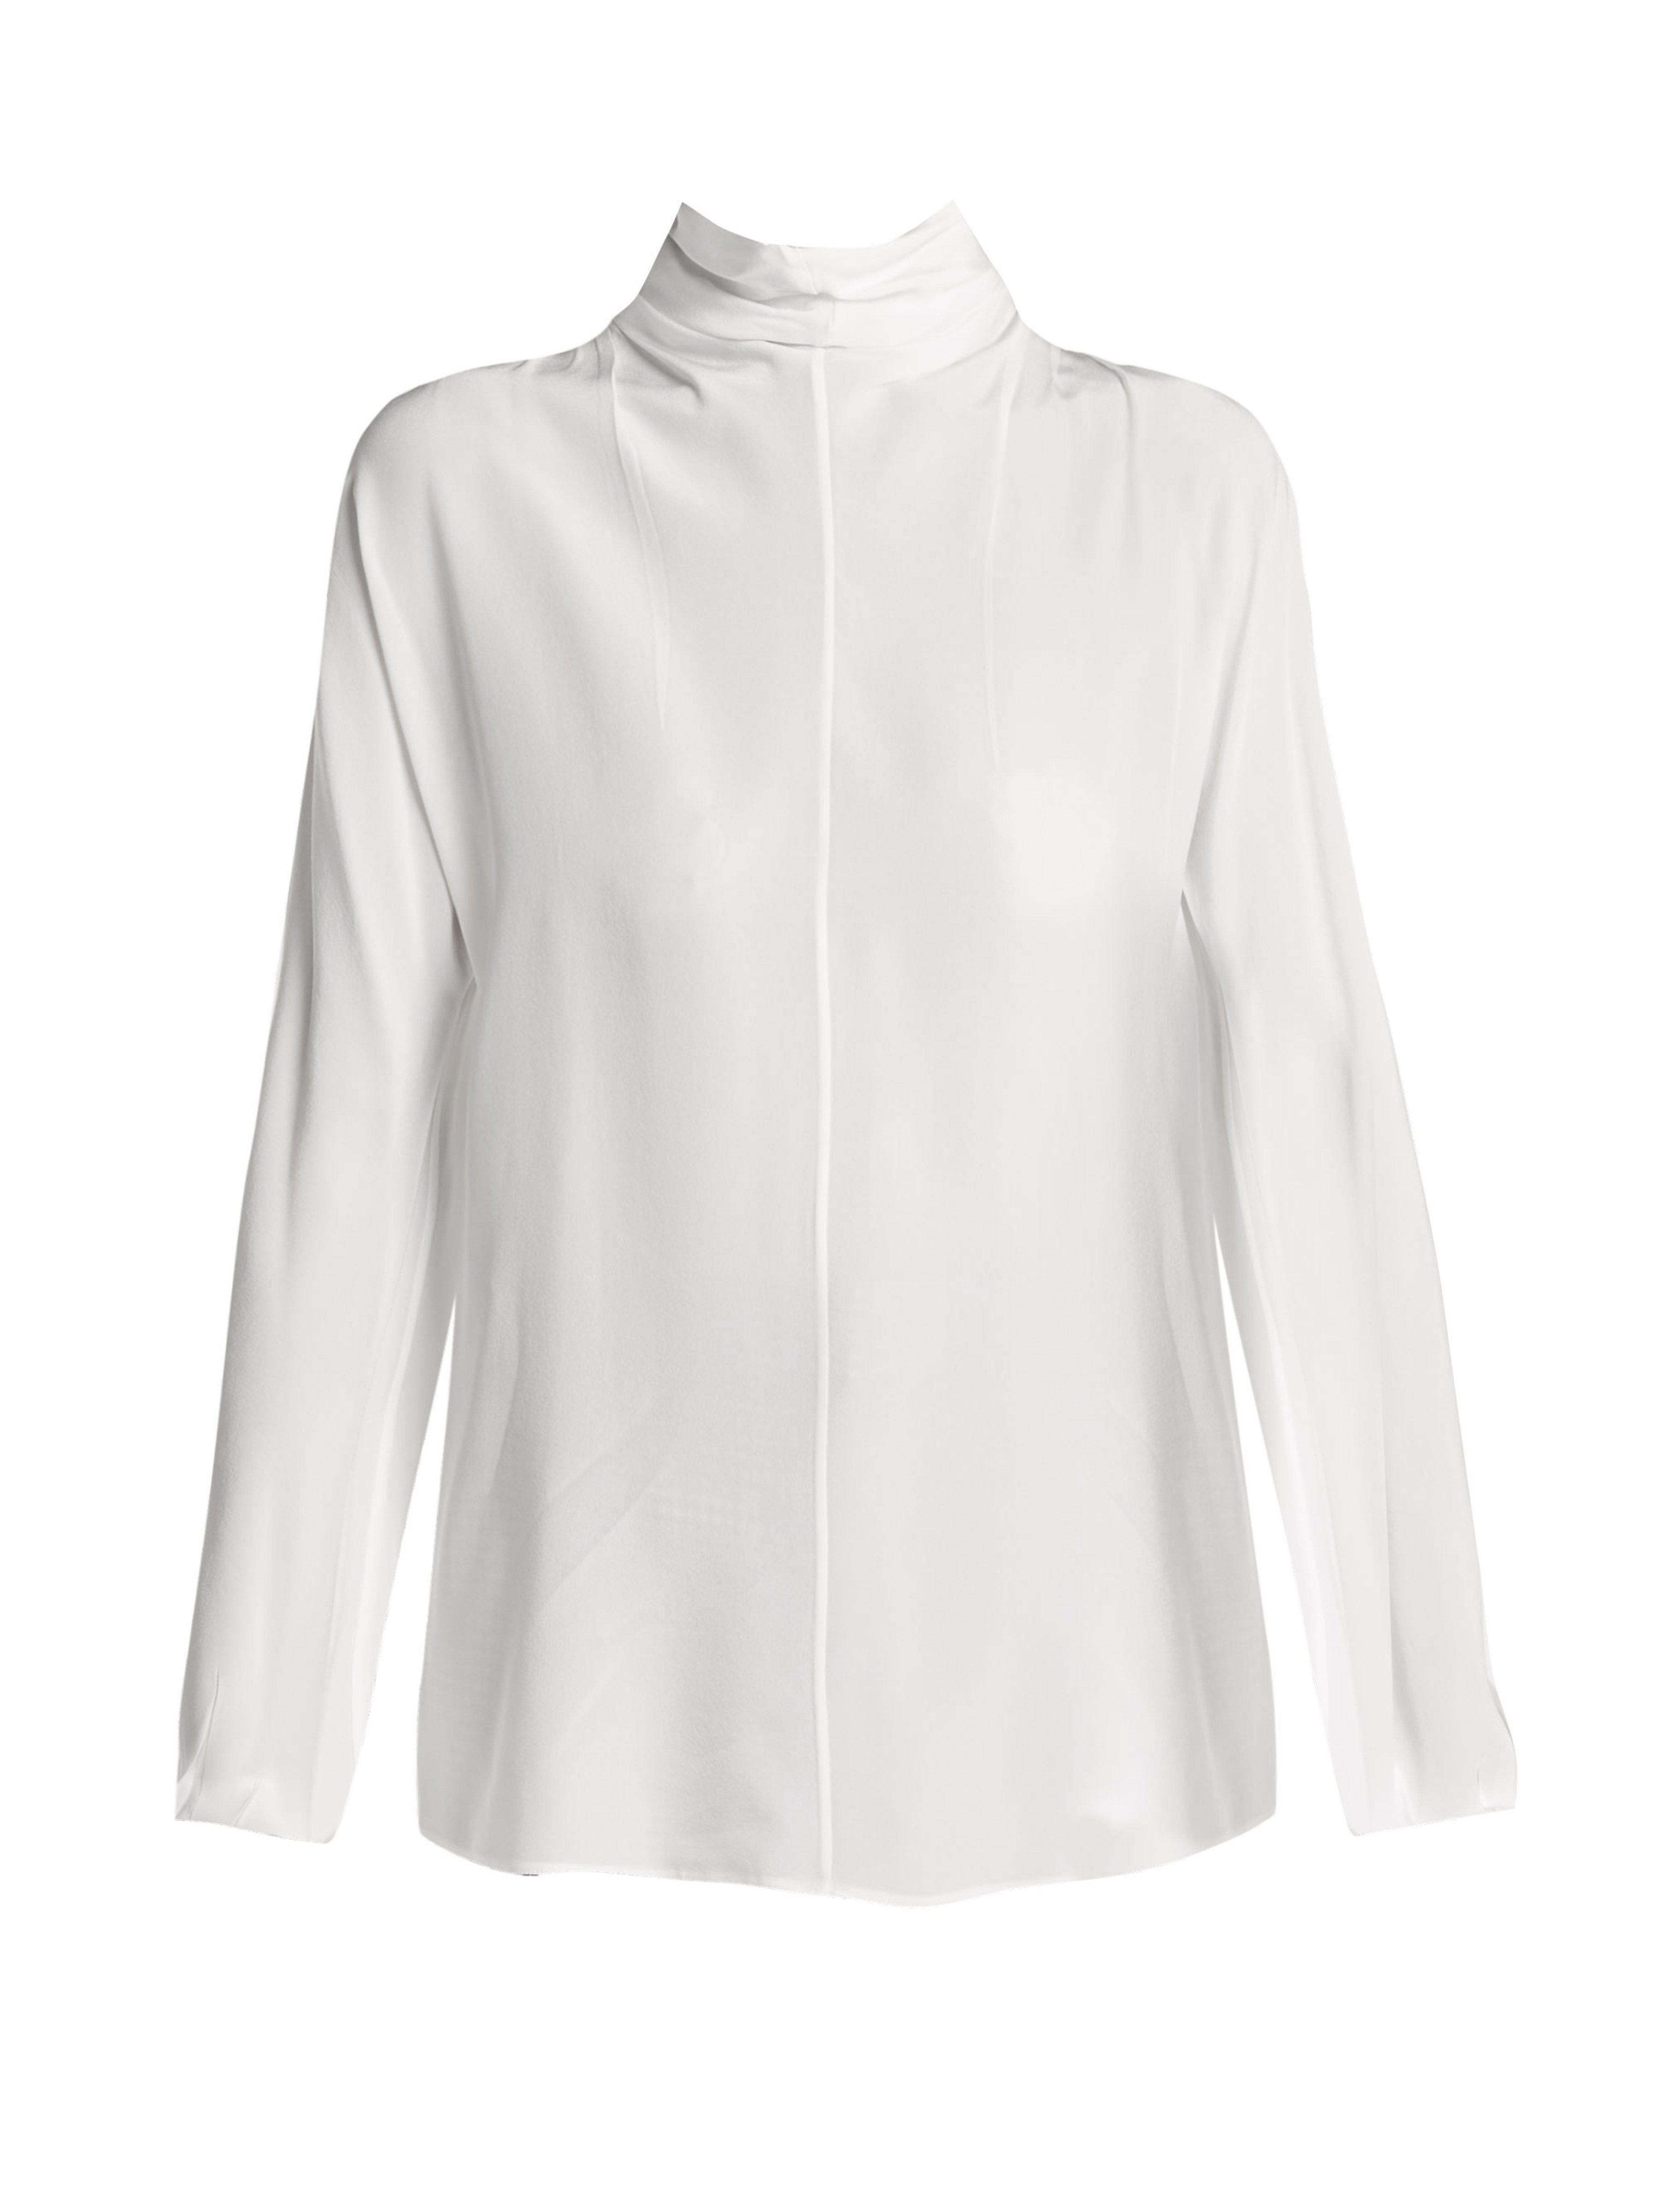 7bf8ec89393e7 Prada Tie Neck Silk Blouse in White - Lyst